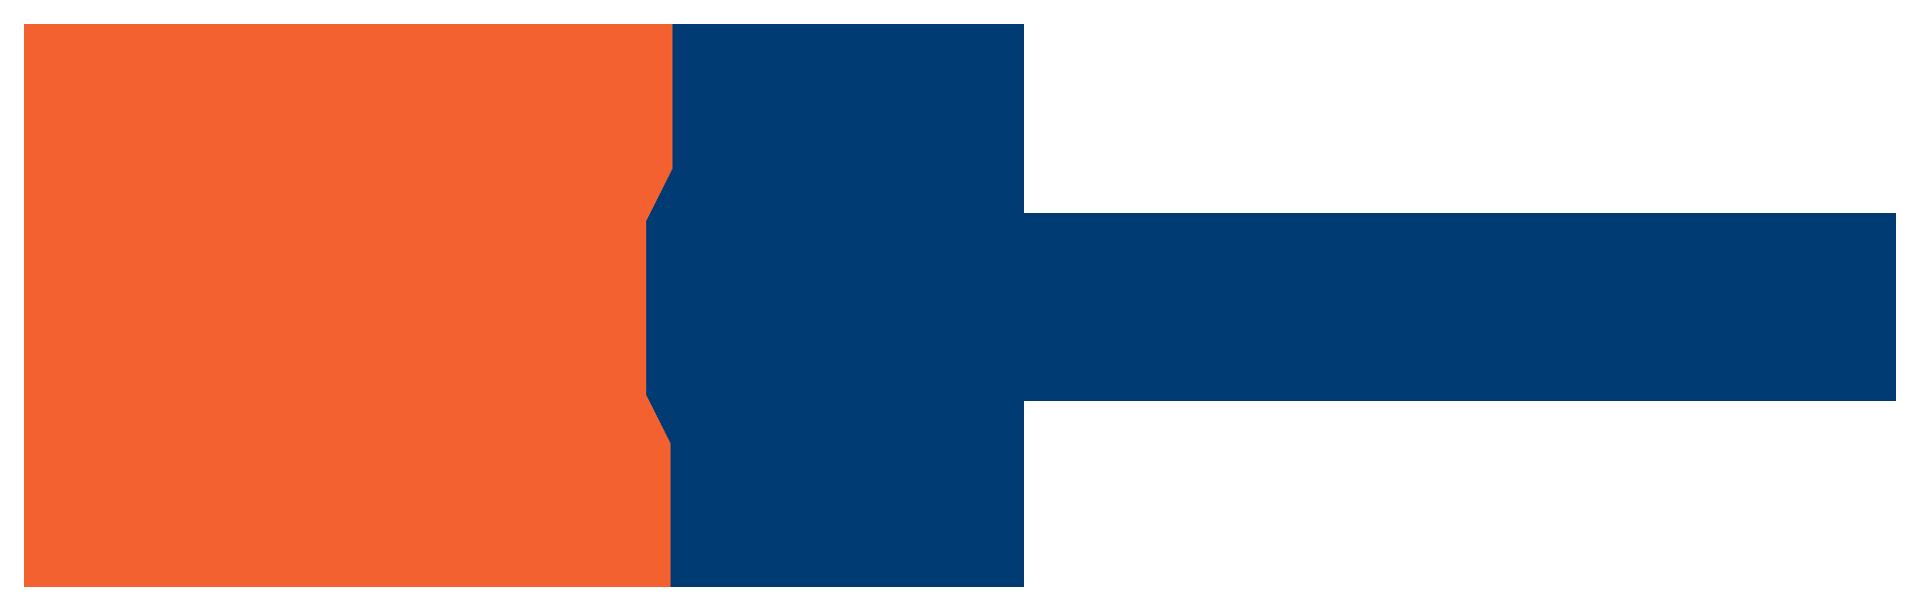 Palico_Logo_1920x611